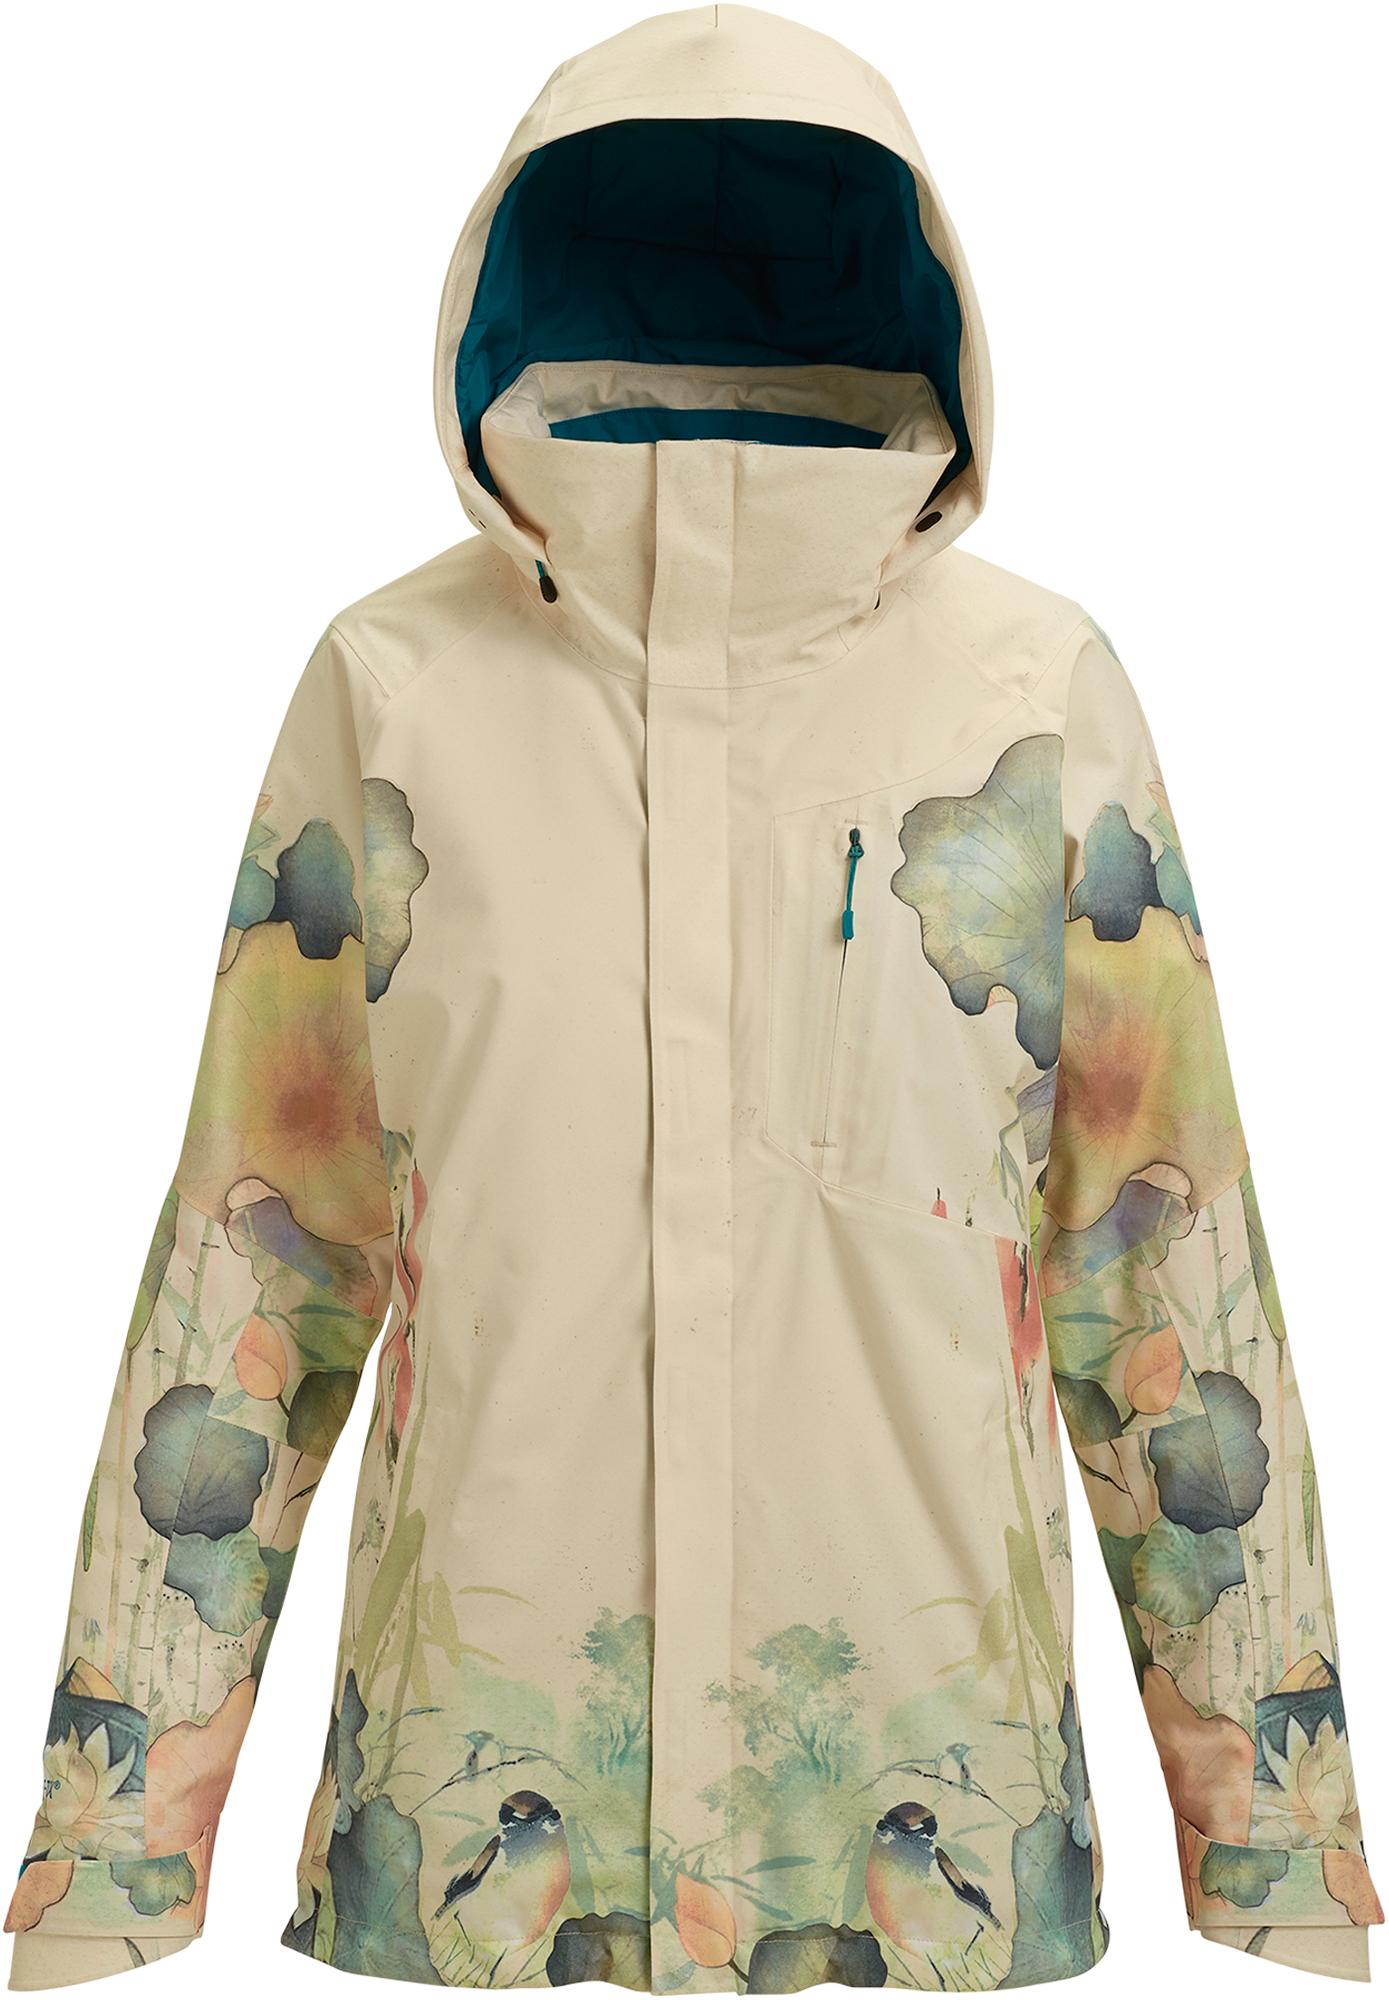 Burton Куртка утепленная женская Ak Gore-Tex Embark, размер 46-48